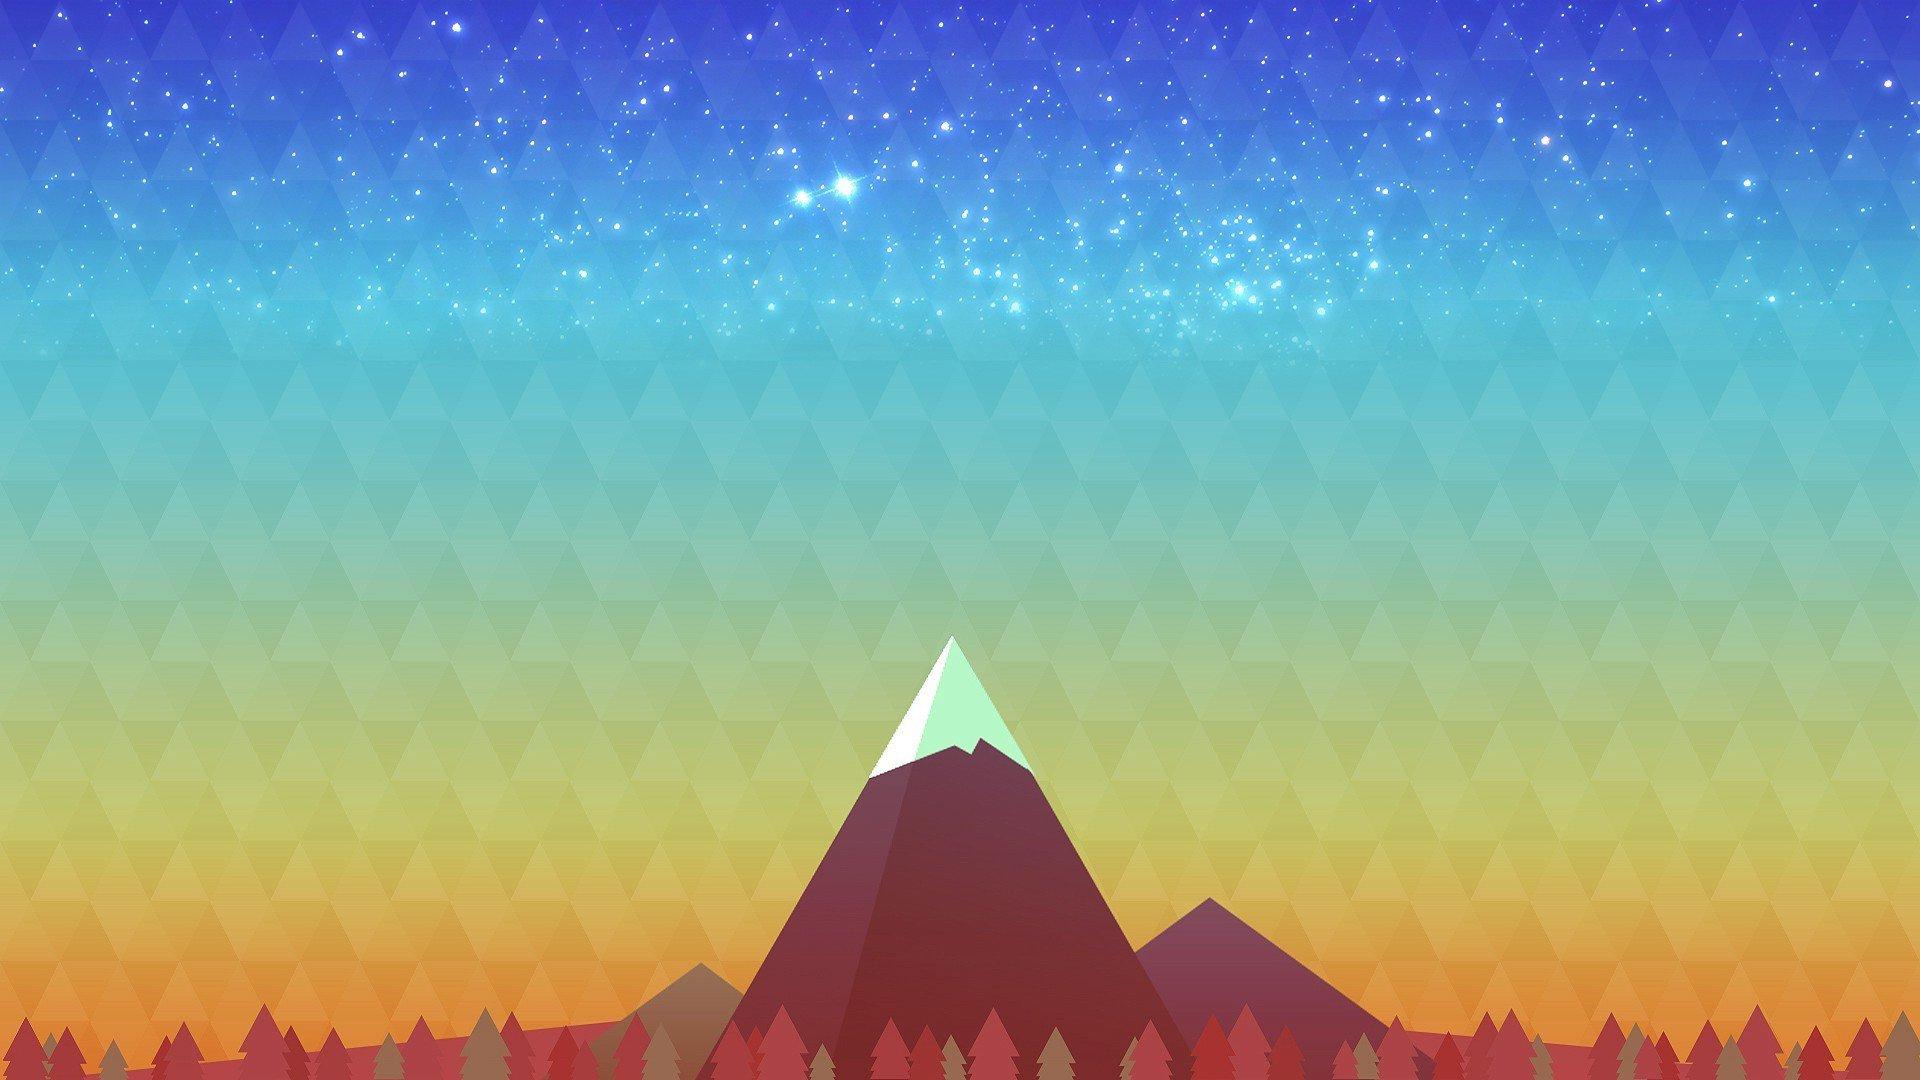 Beautiful Wallpaper Mountain Art - mountain-peak-digital-art-wallpaper-62627-64603-hd-wallpapers  You Should Have_369344.jpg